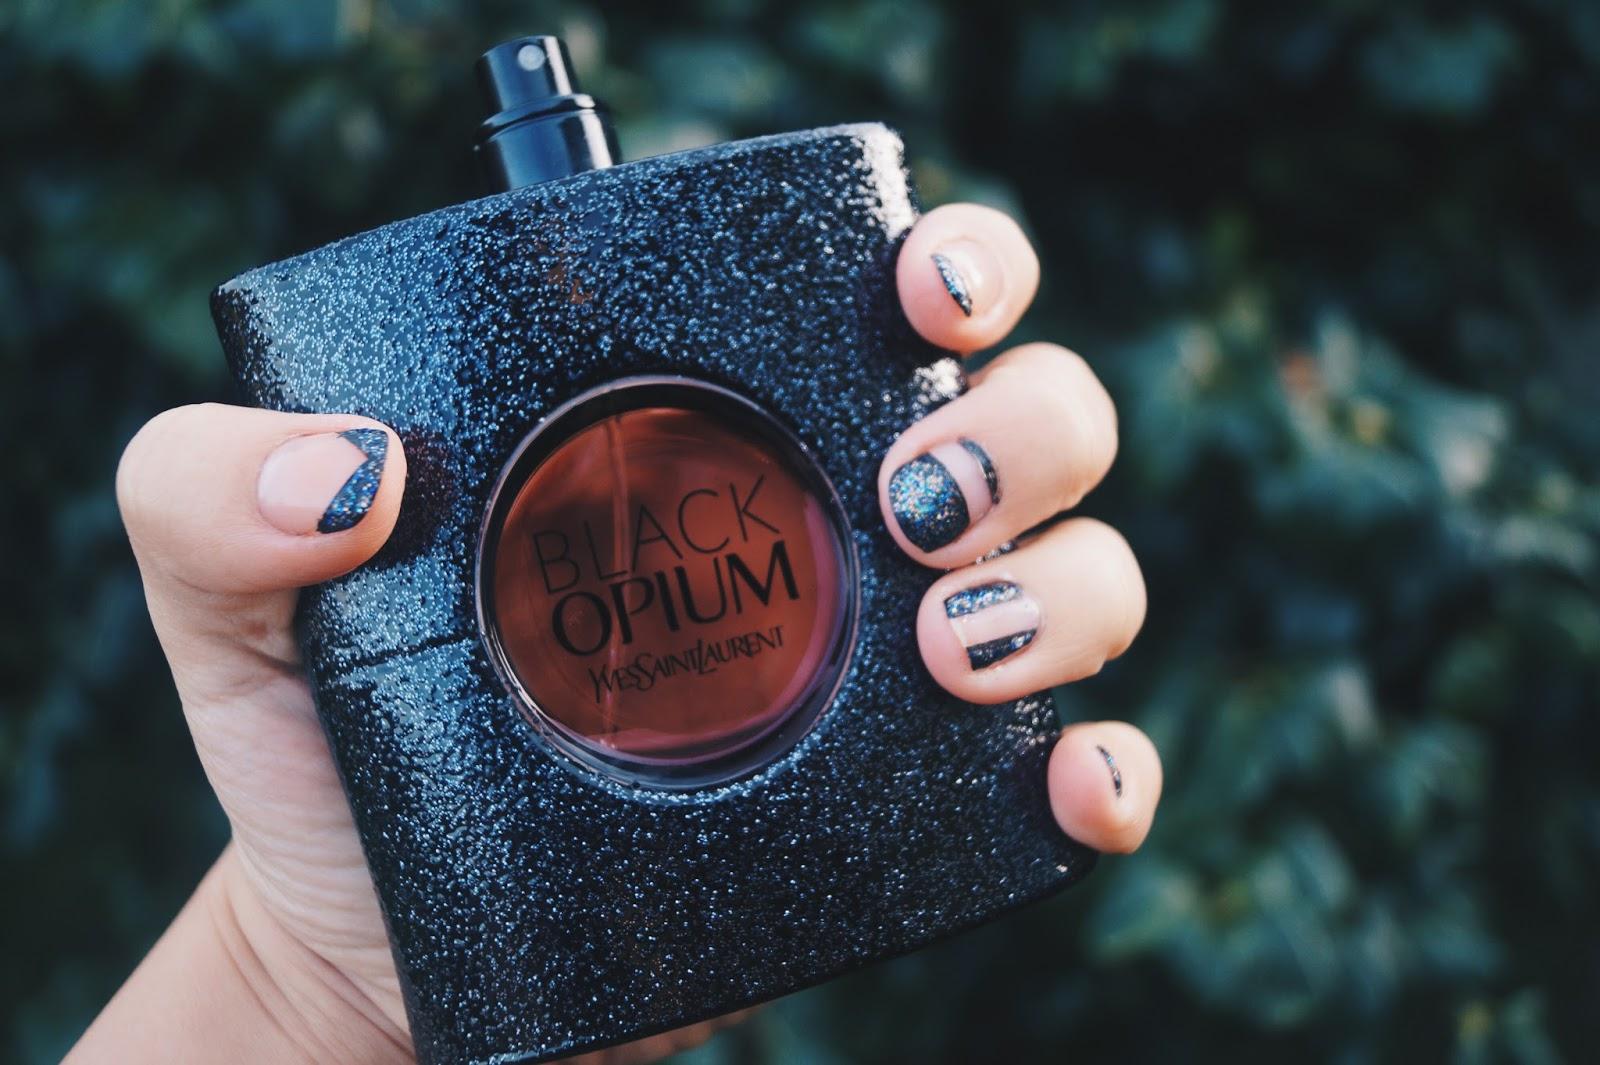 Ana Maddock- Black Opium, YSL Beauty, Yves Saint Laurent Fragrances